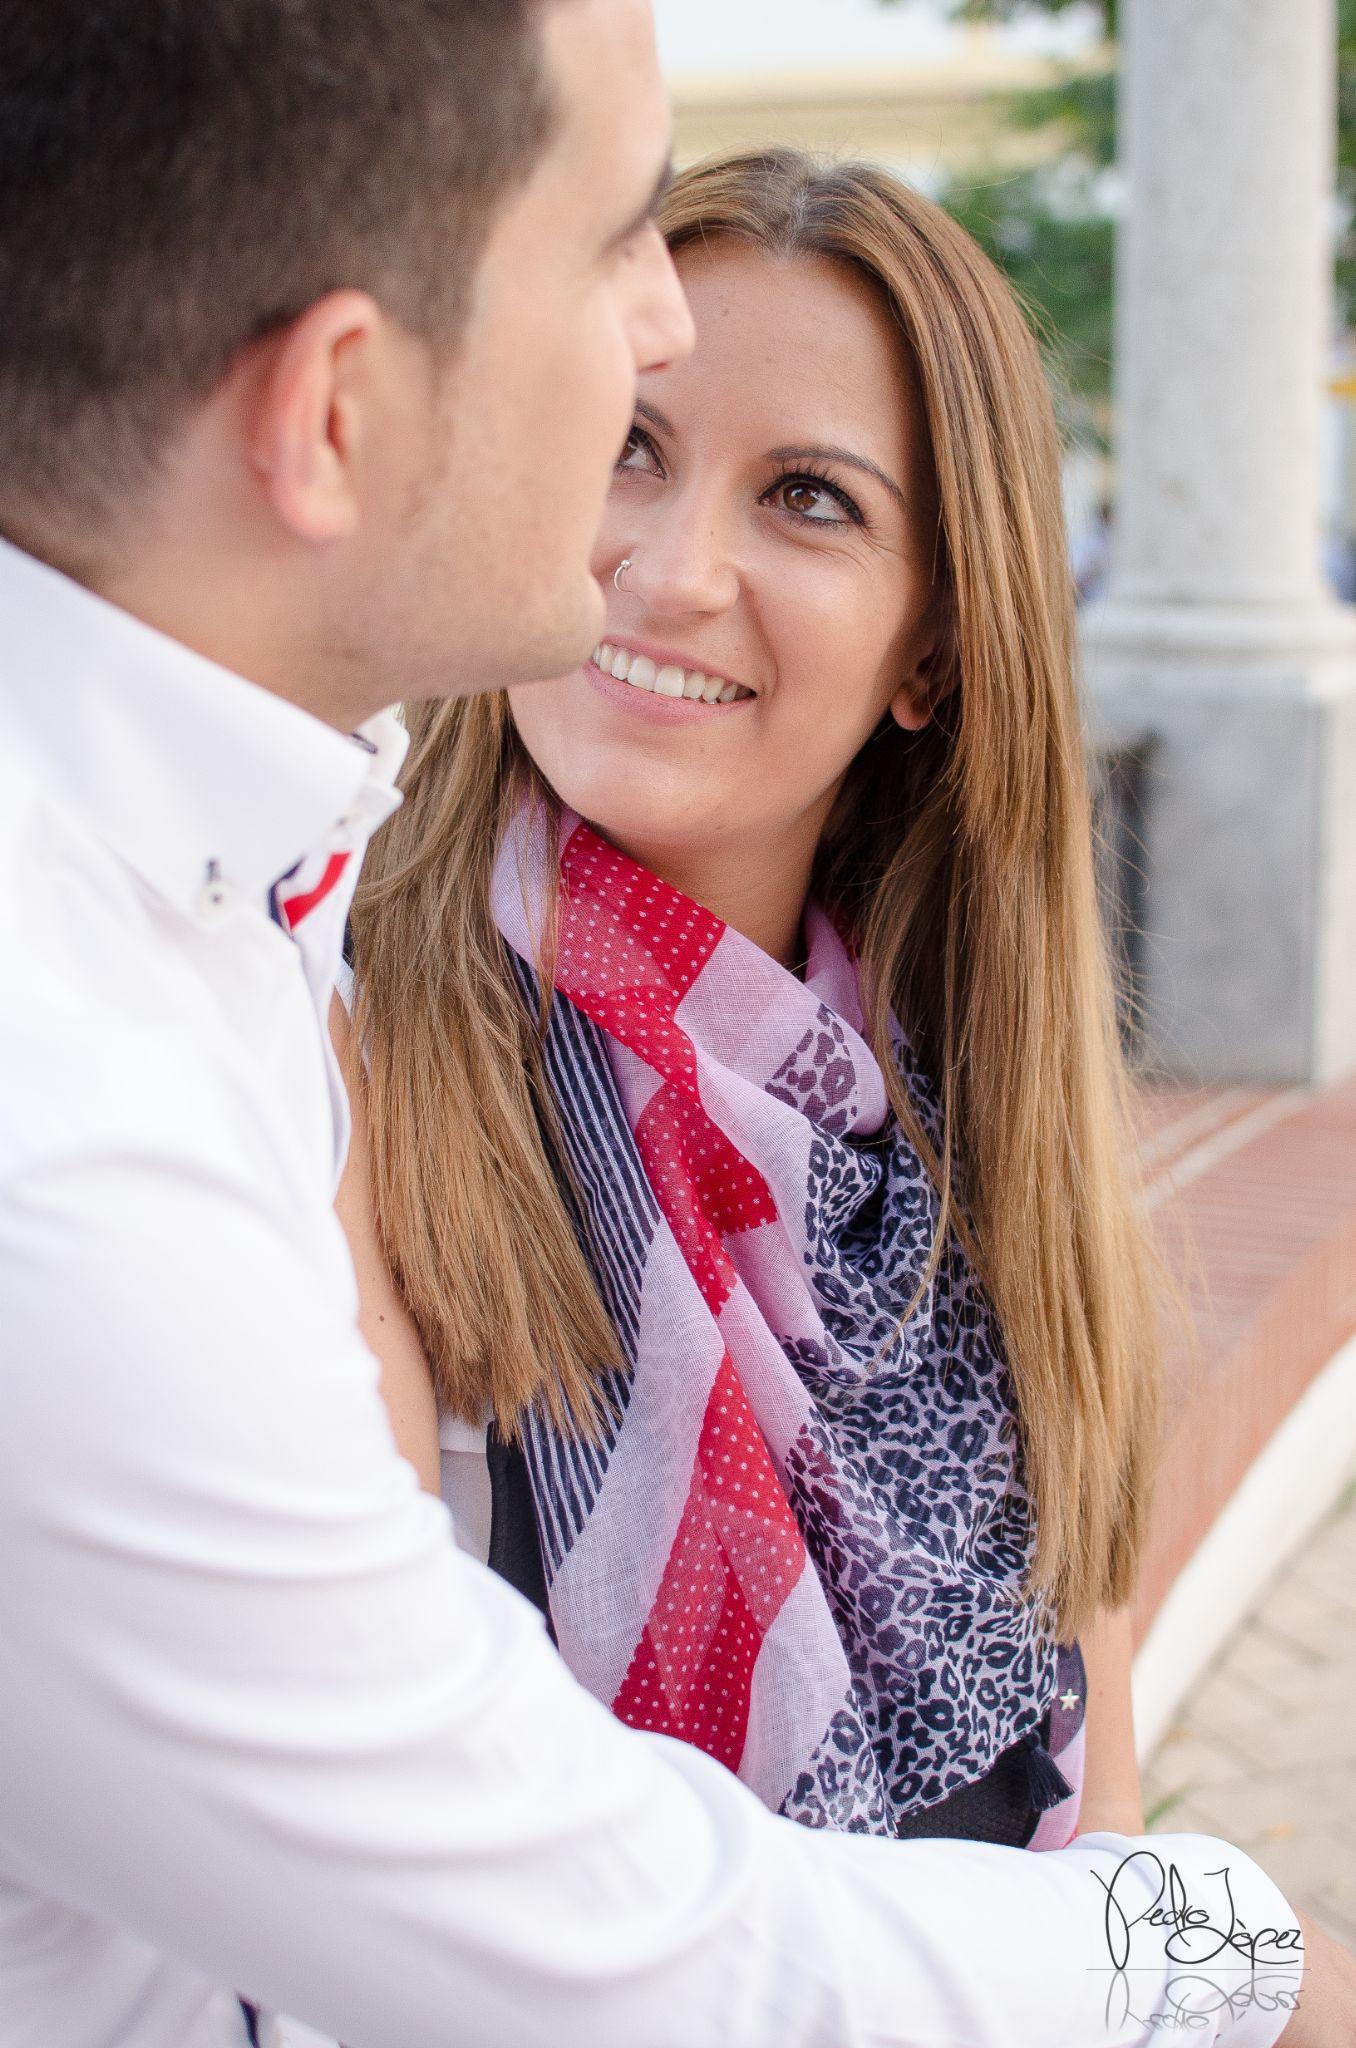 Sara & Jorge by pedro.lopezfotografia